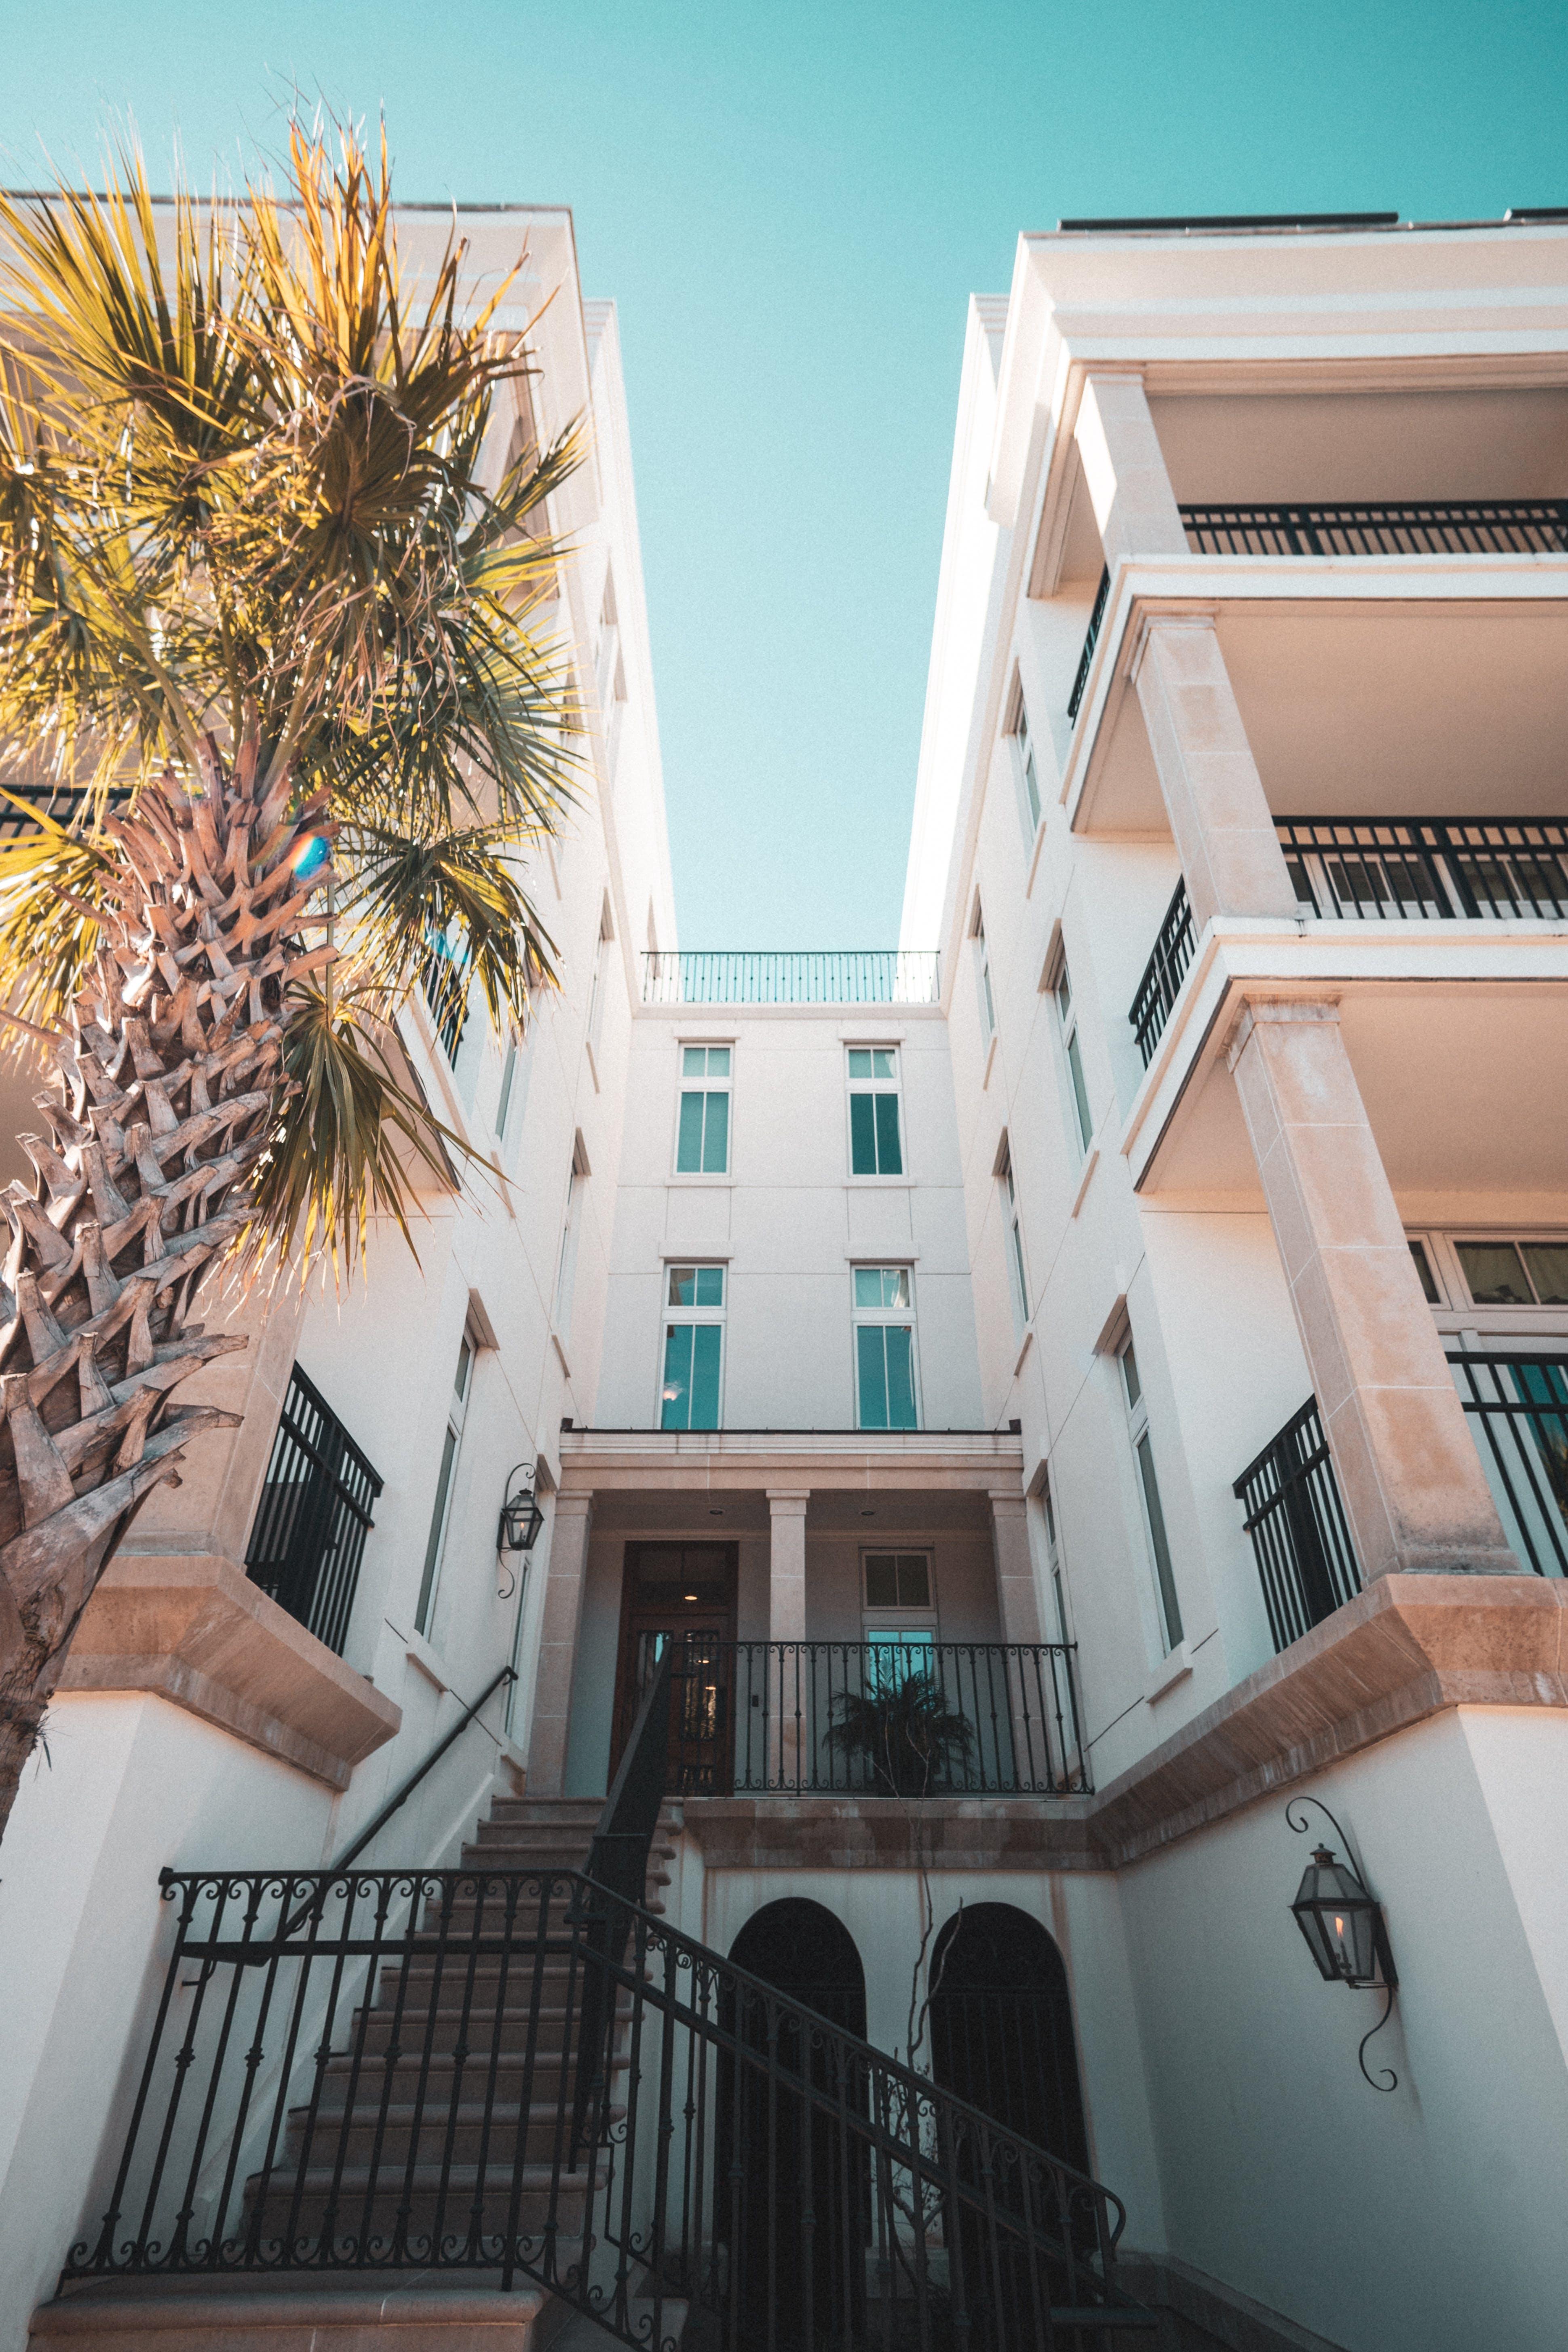 architektur, architekturdesign, balkone